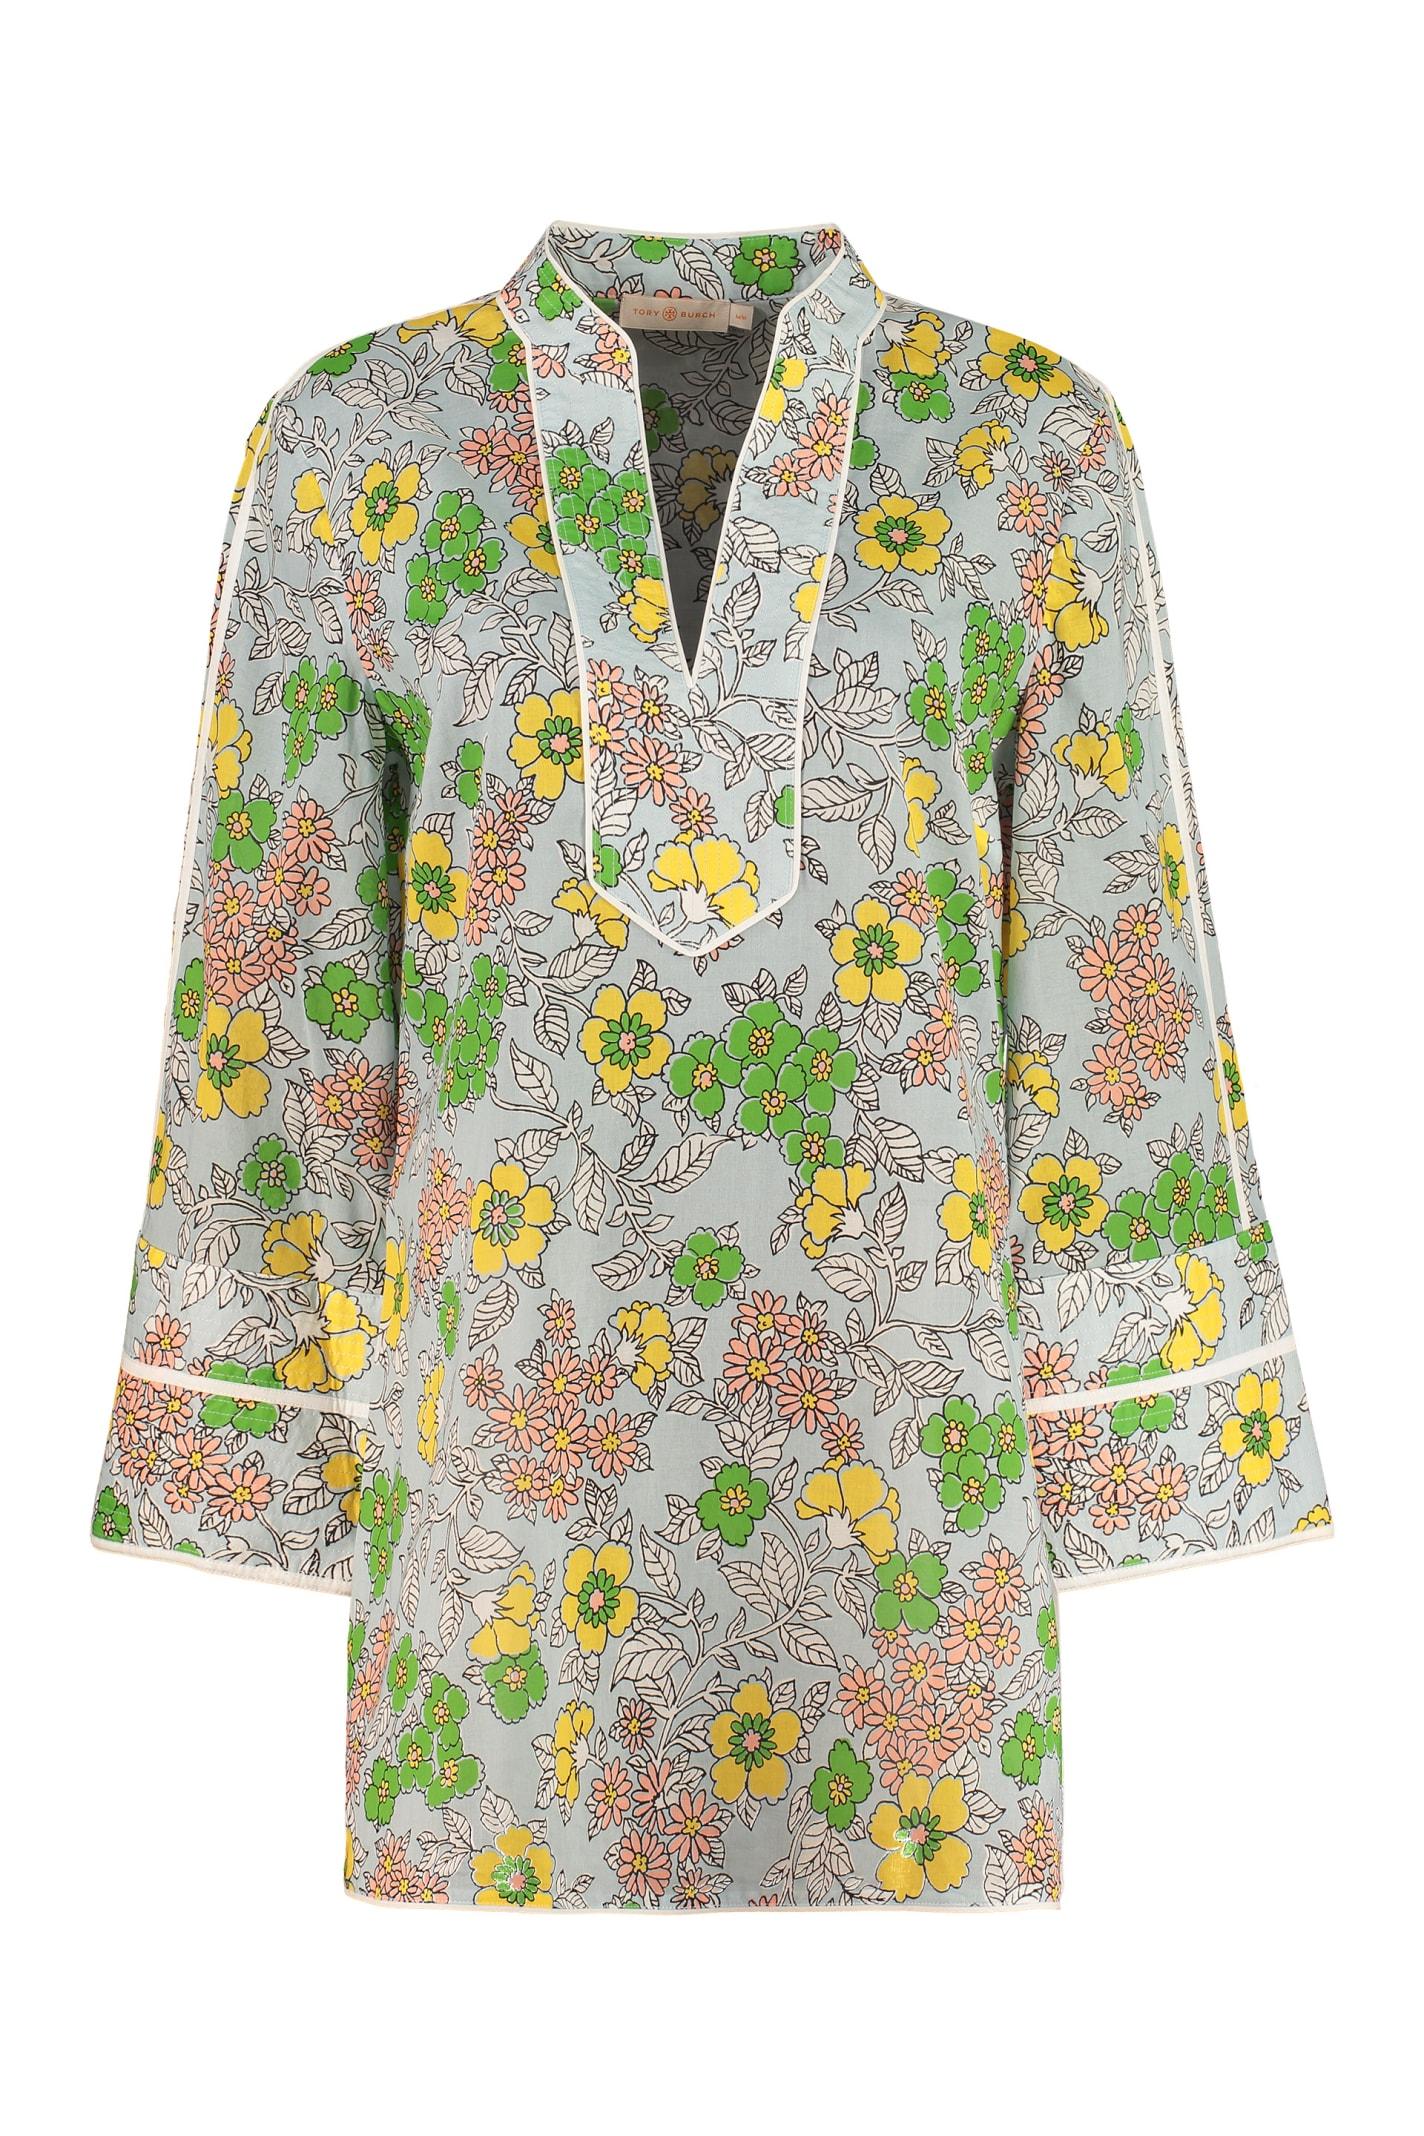 Tory Burch Printed Cotton Tunic-top